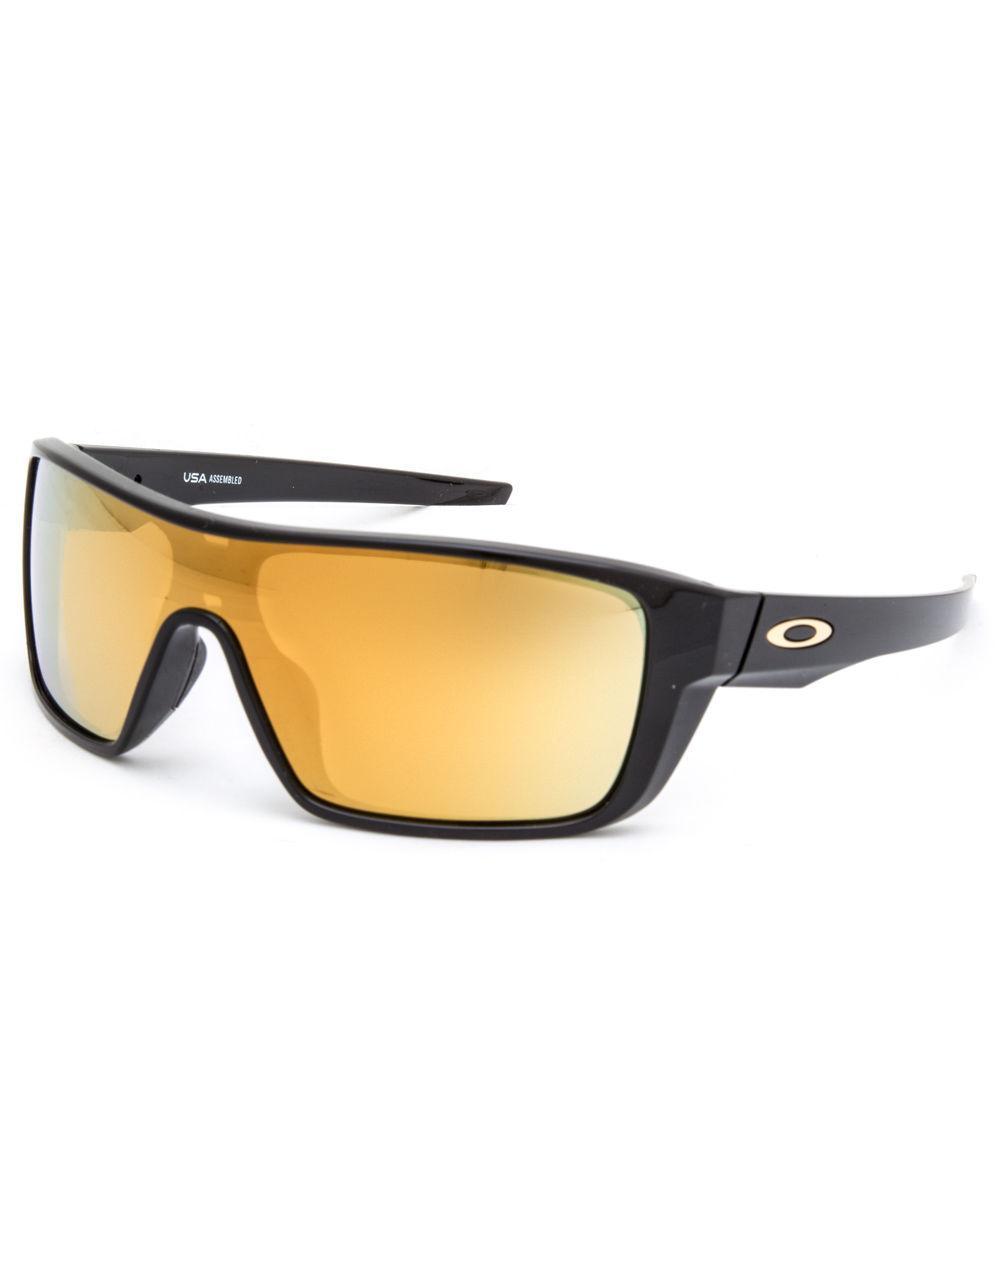 Lyst - Oakley Straightback Polished Black   24k Iridium Sunglasses ... bf3860b44b